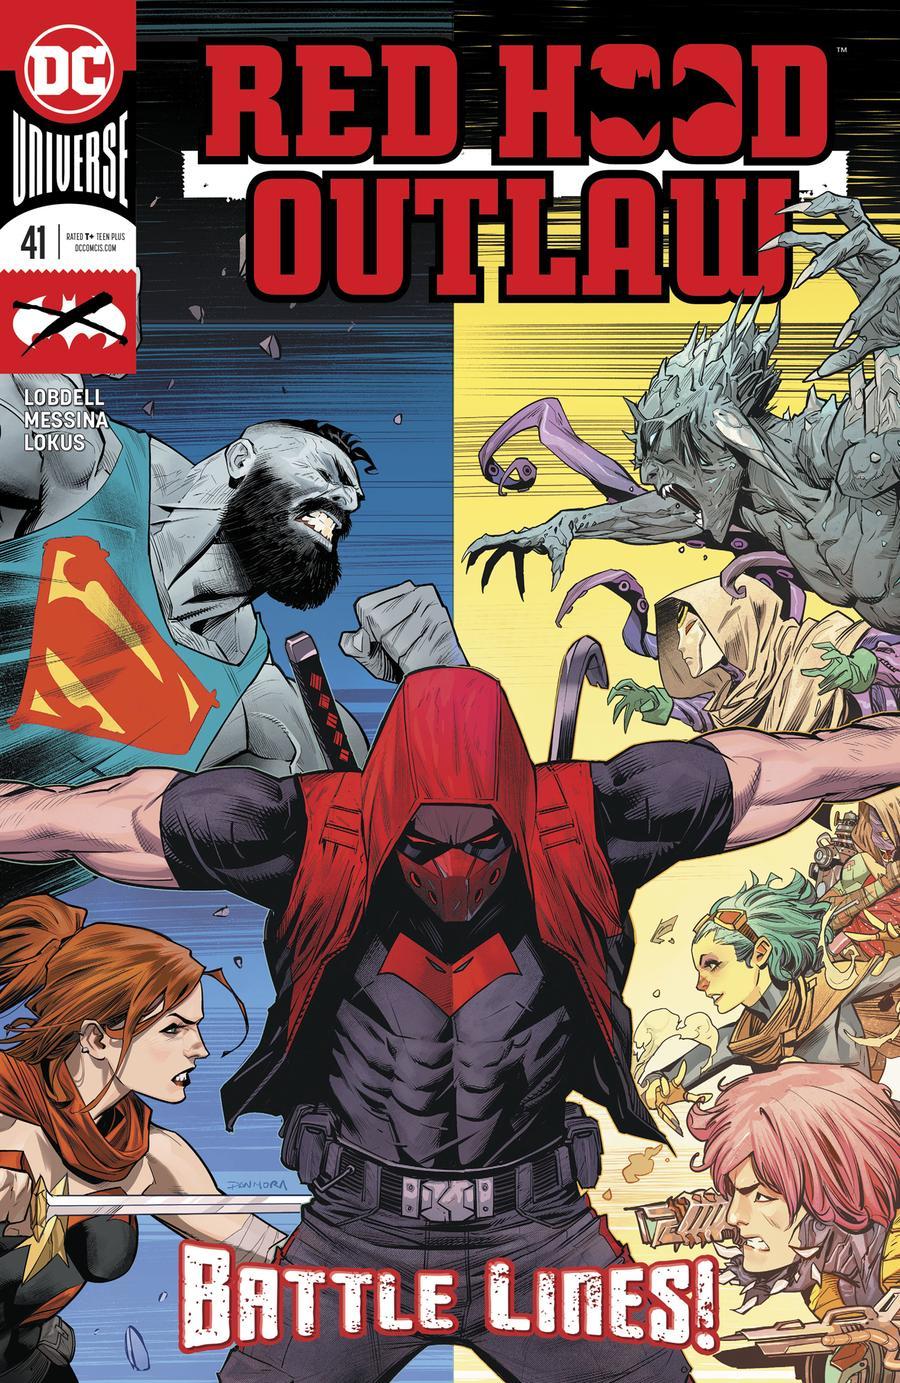 Red Hood Outlaw #41 Cover A Regular Dan Mora Cover